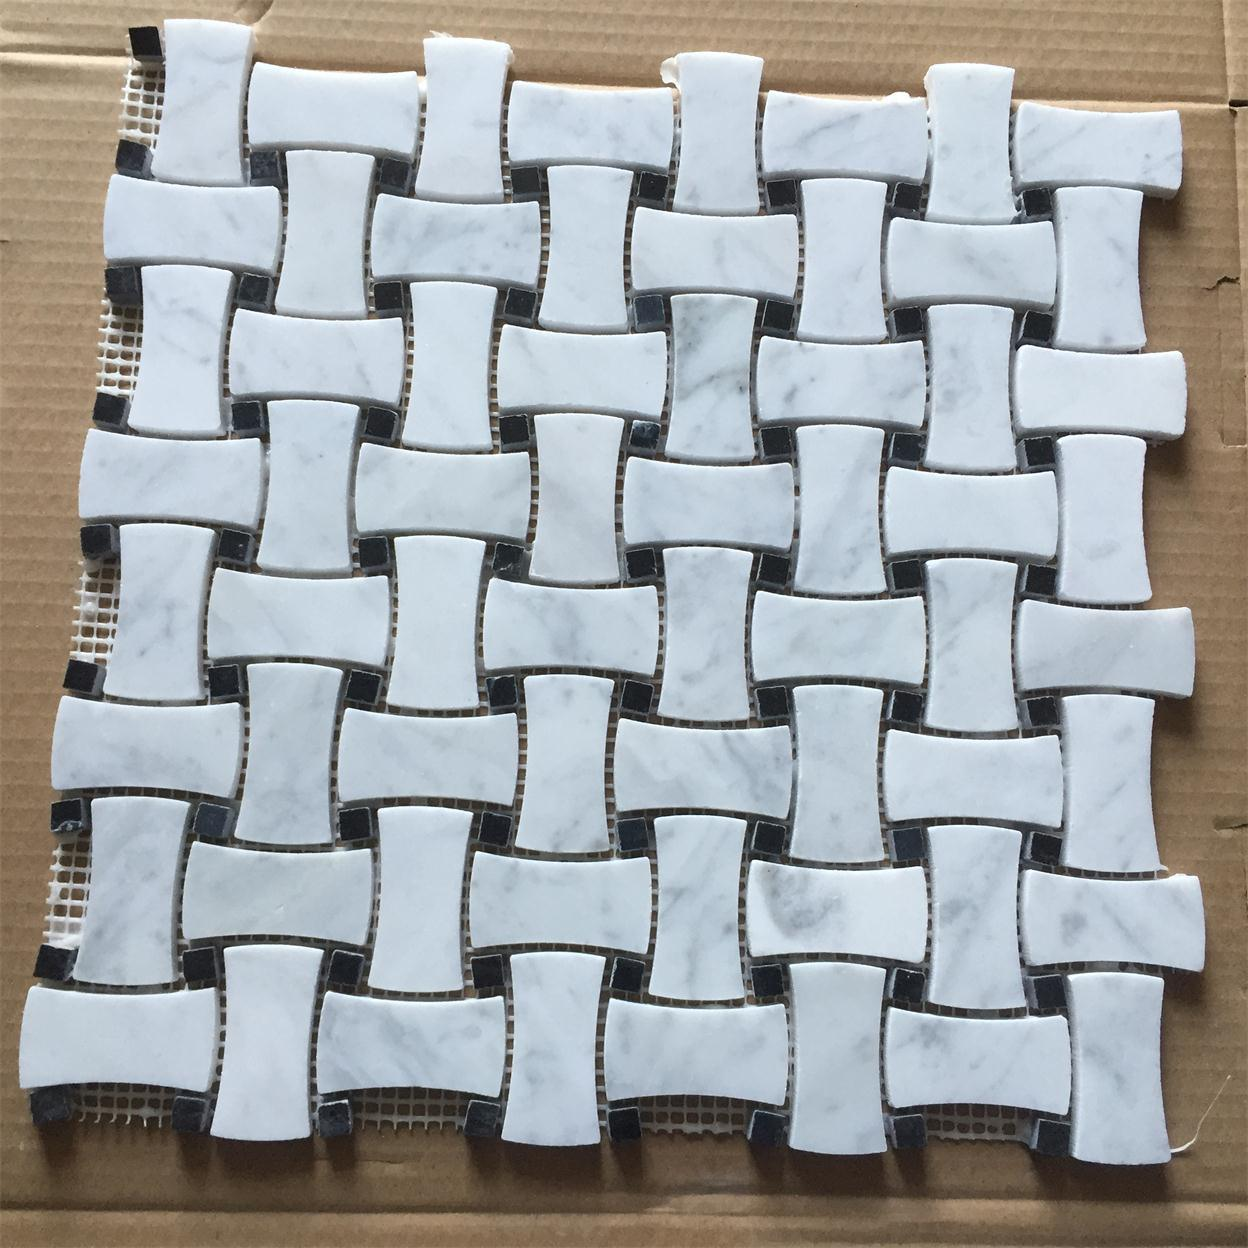 China Bianco Carrara White Marble Granite Stone Mosaic for Bathroom Wall